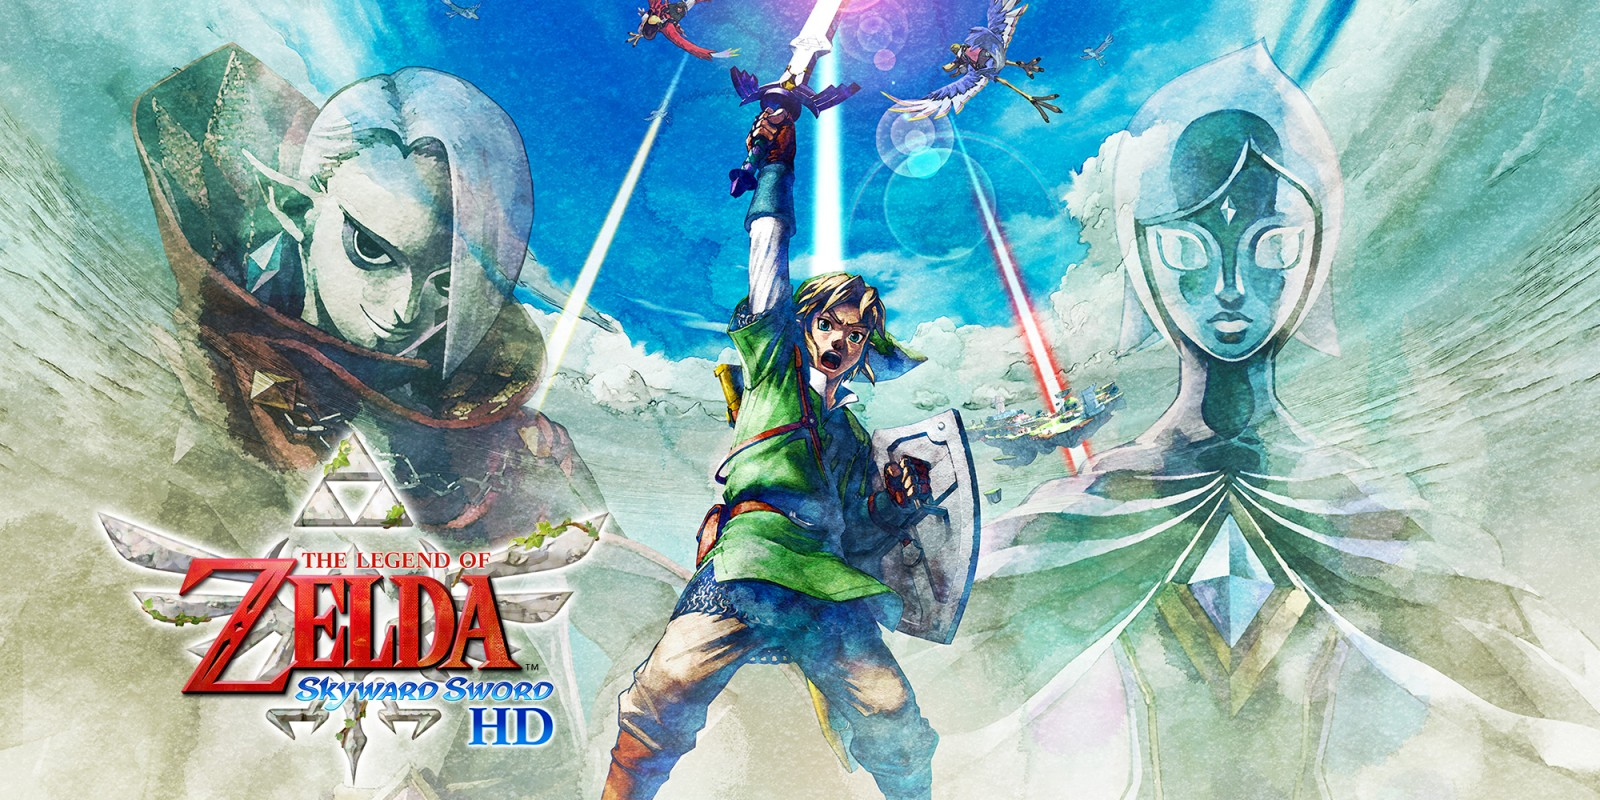 The Legend of Zelda: Skyward Sword HD - GamersRD